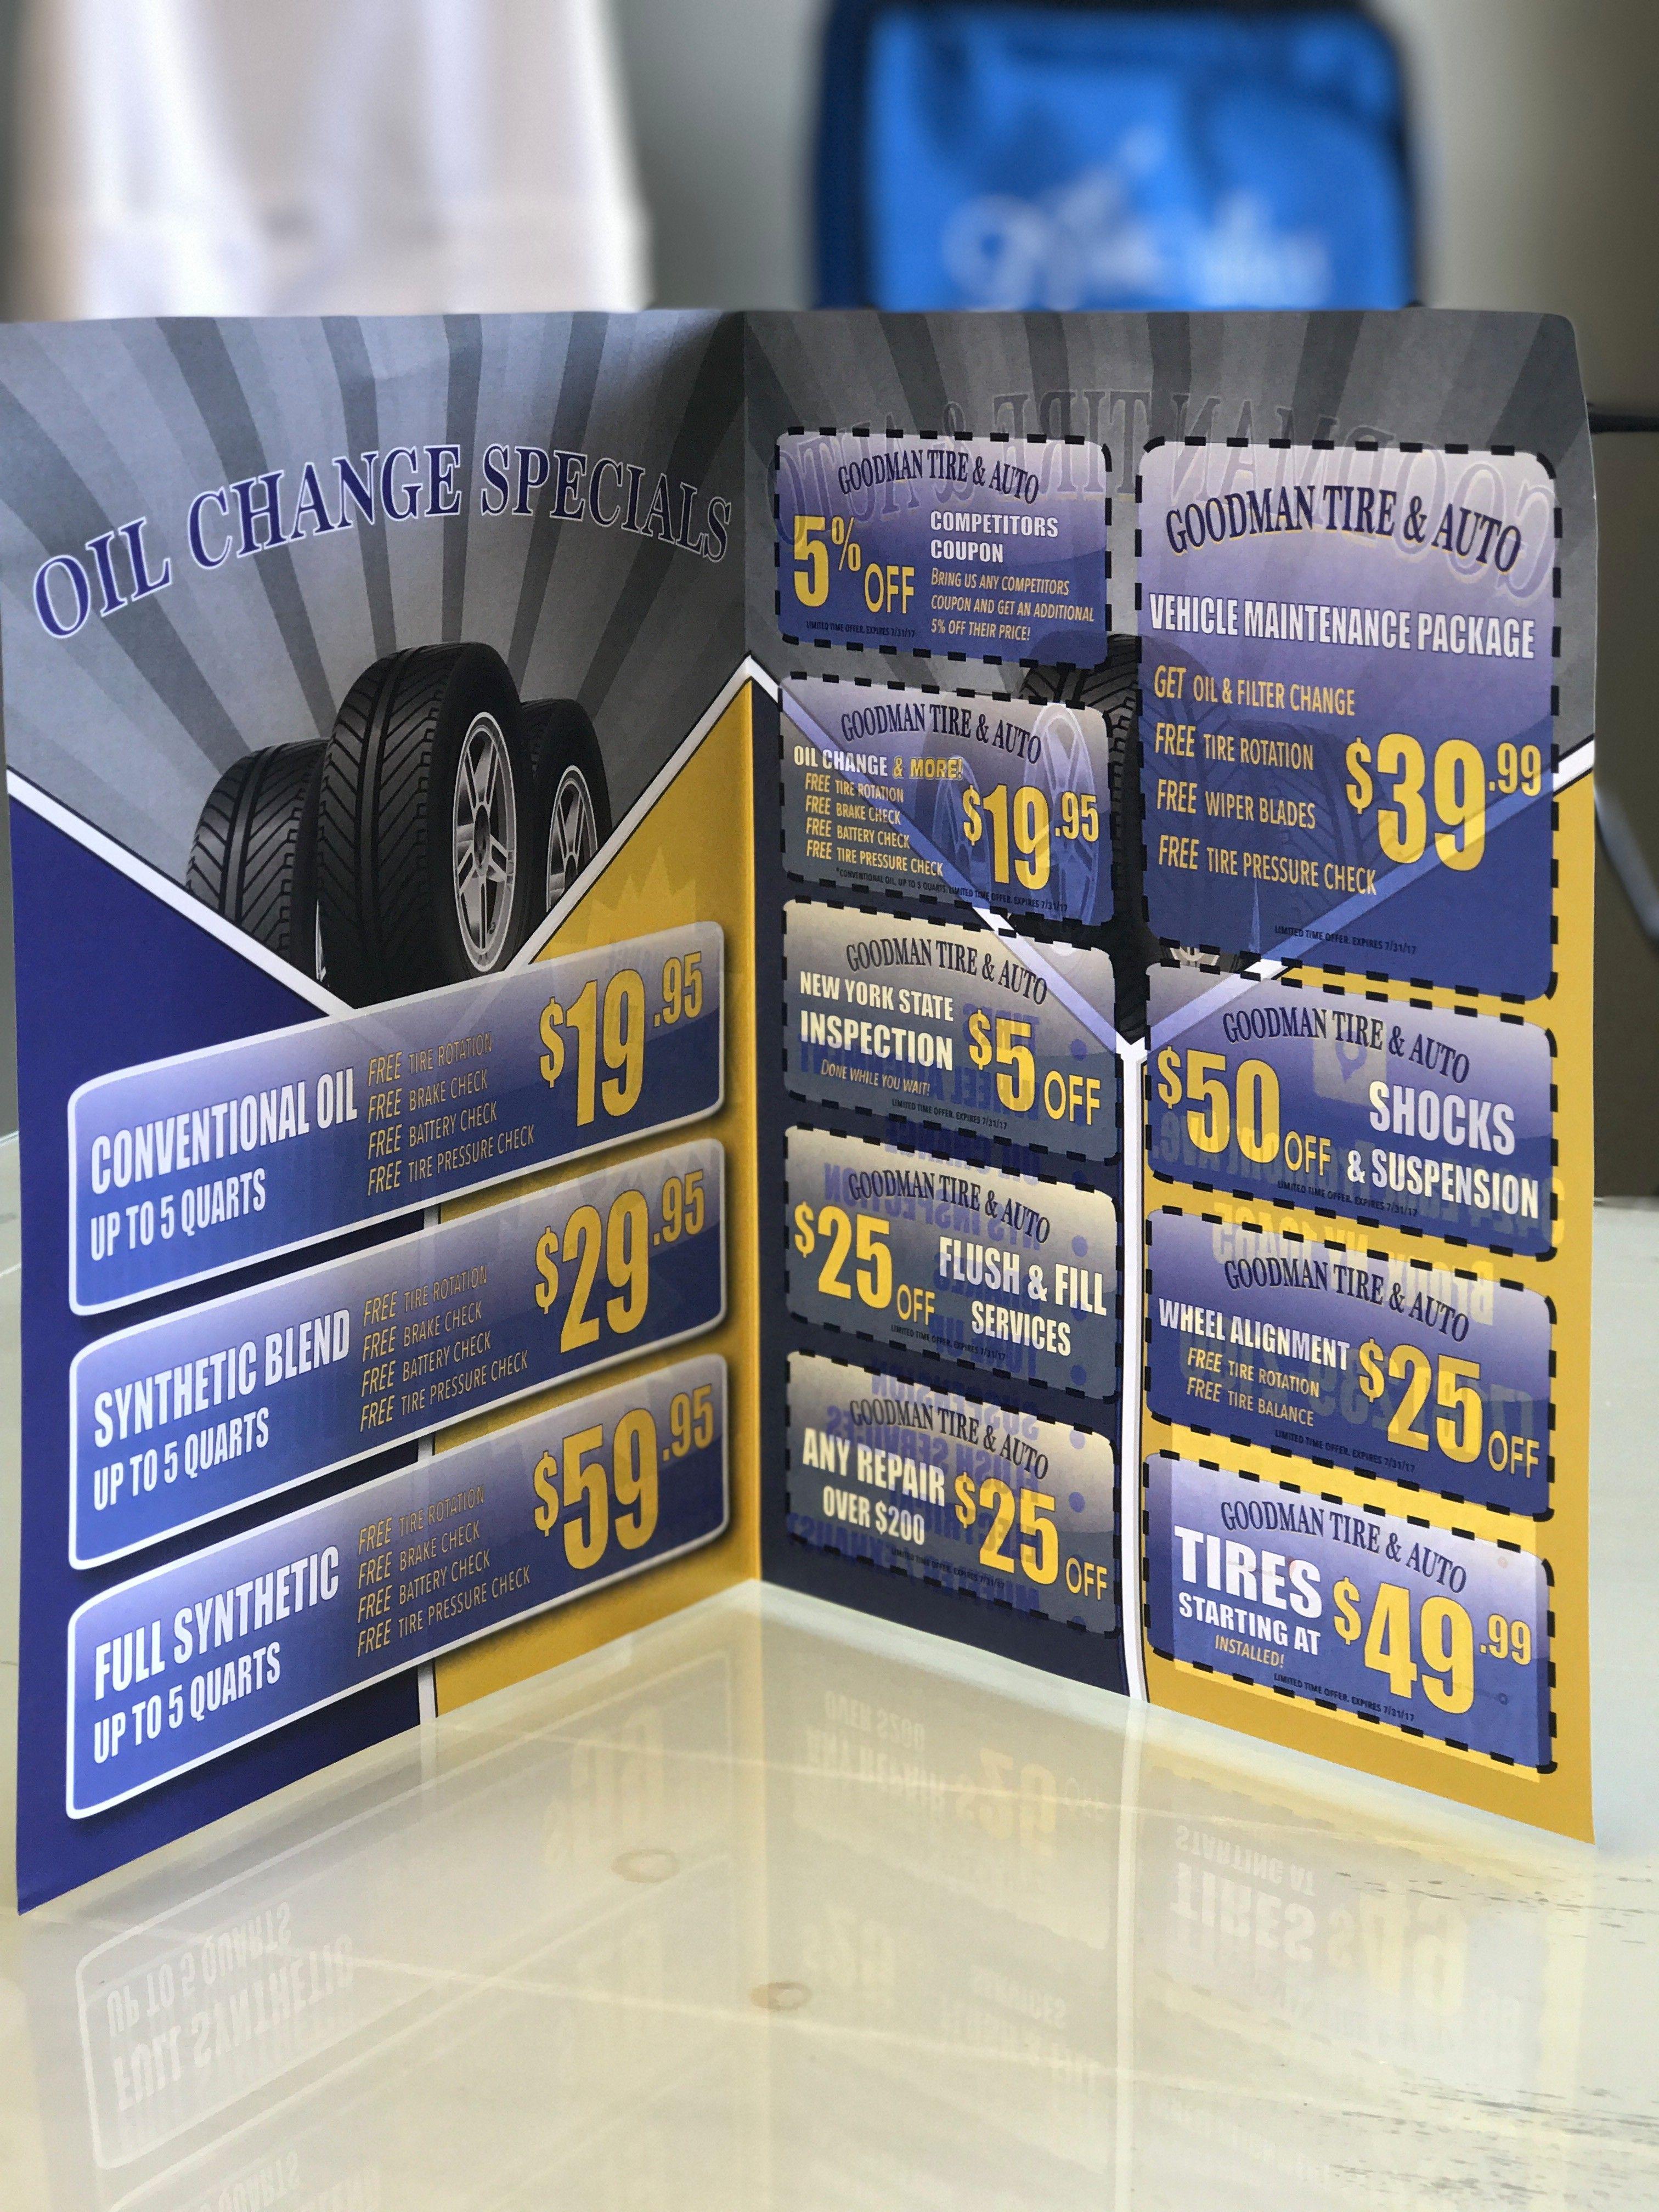 Goodman Tire & Auto